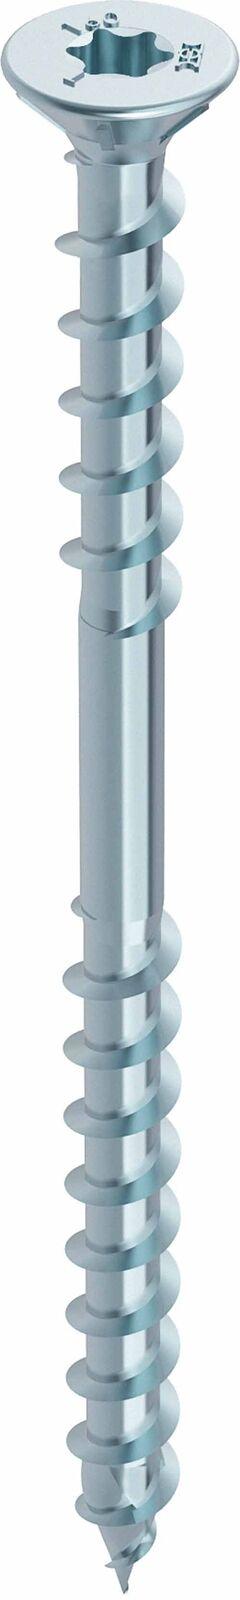 HECO-TOPIX-Therm Holzbauschraube blau blau blau verzinkt UK-Gewinde Senkkopf TX-Antrieb bb380b